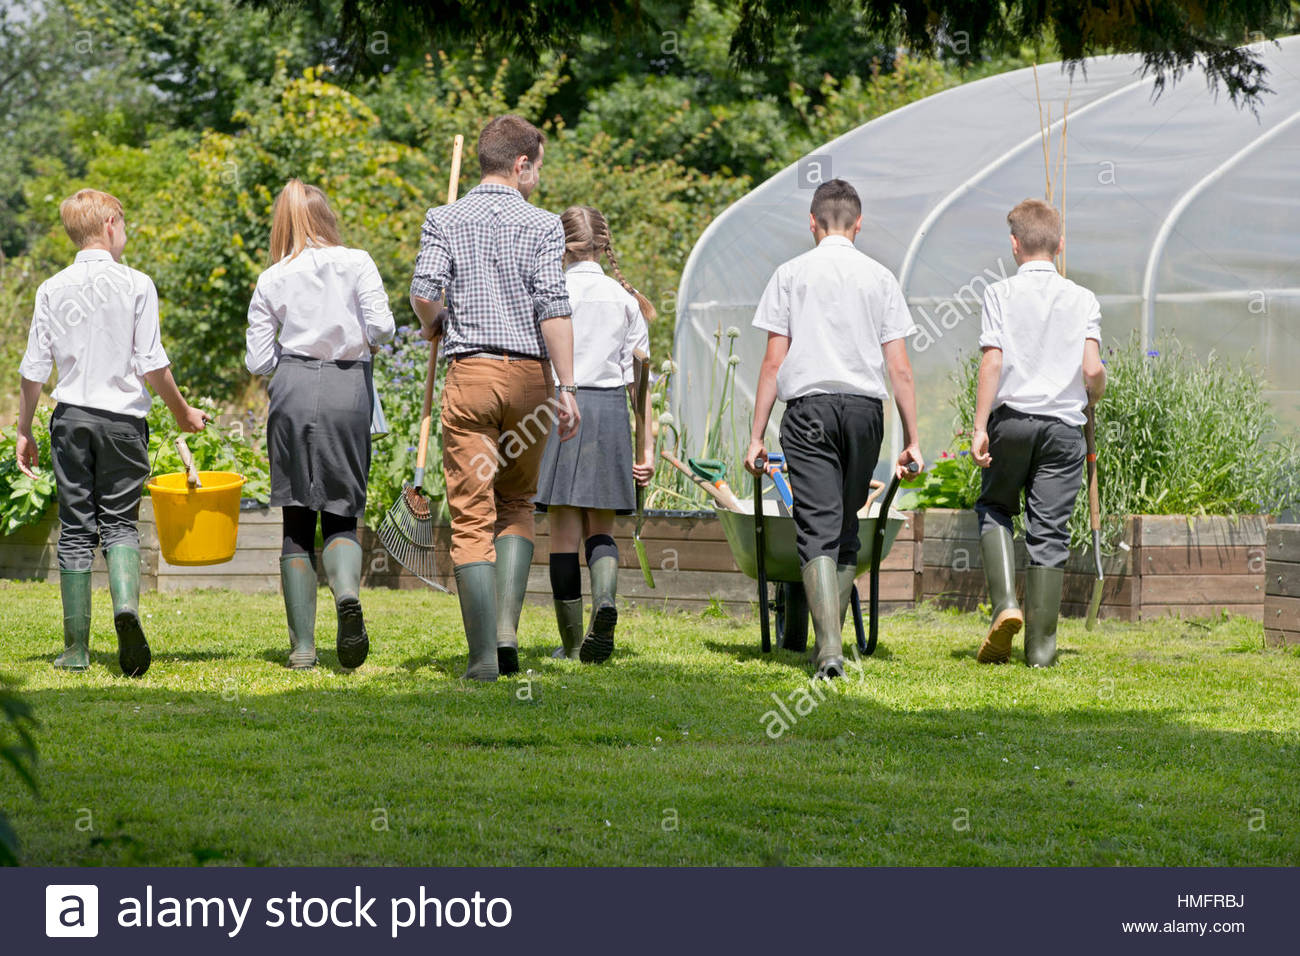 School vegetable gardens -  Teacher And Middle School Students With Wheelbarrow Learning Gardening In Vegetable Garden Stock Photo